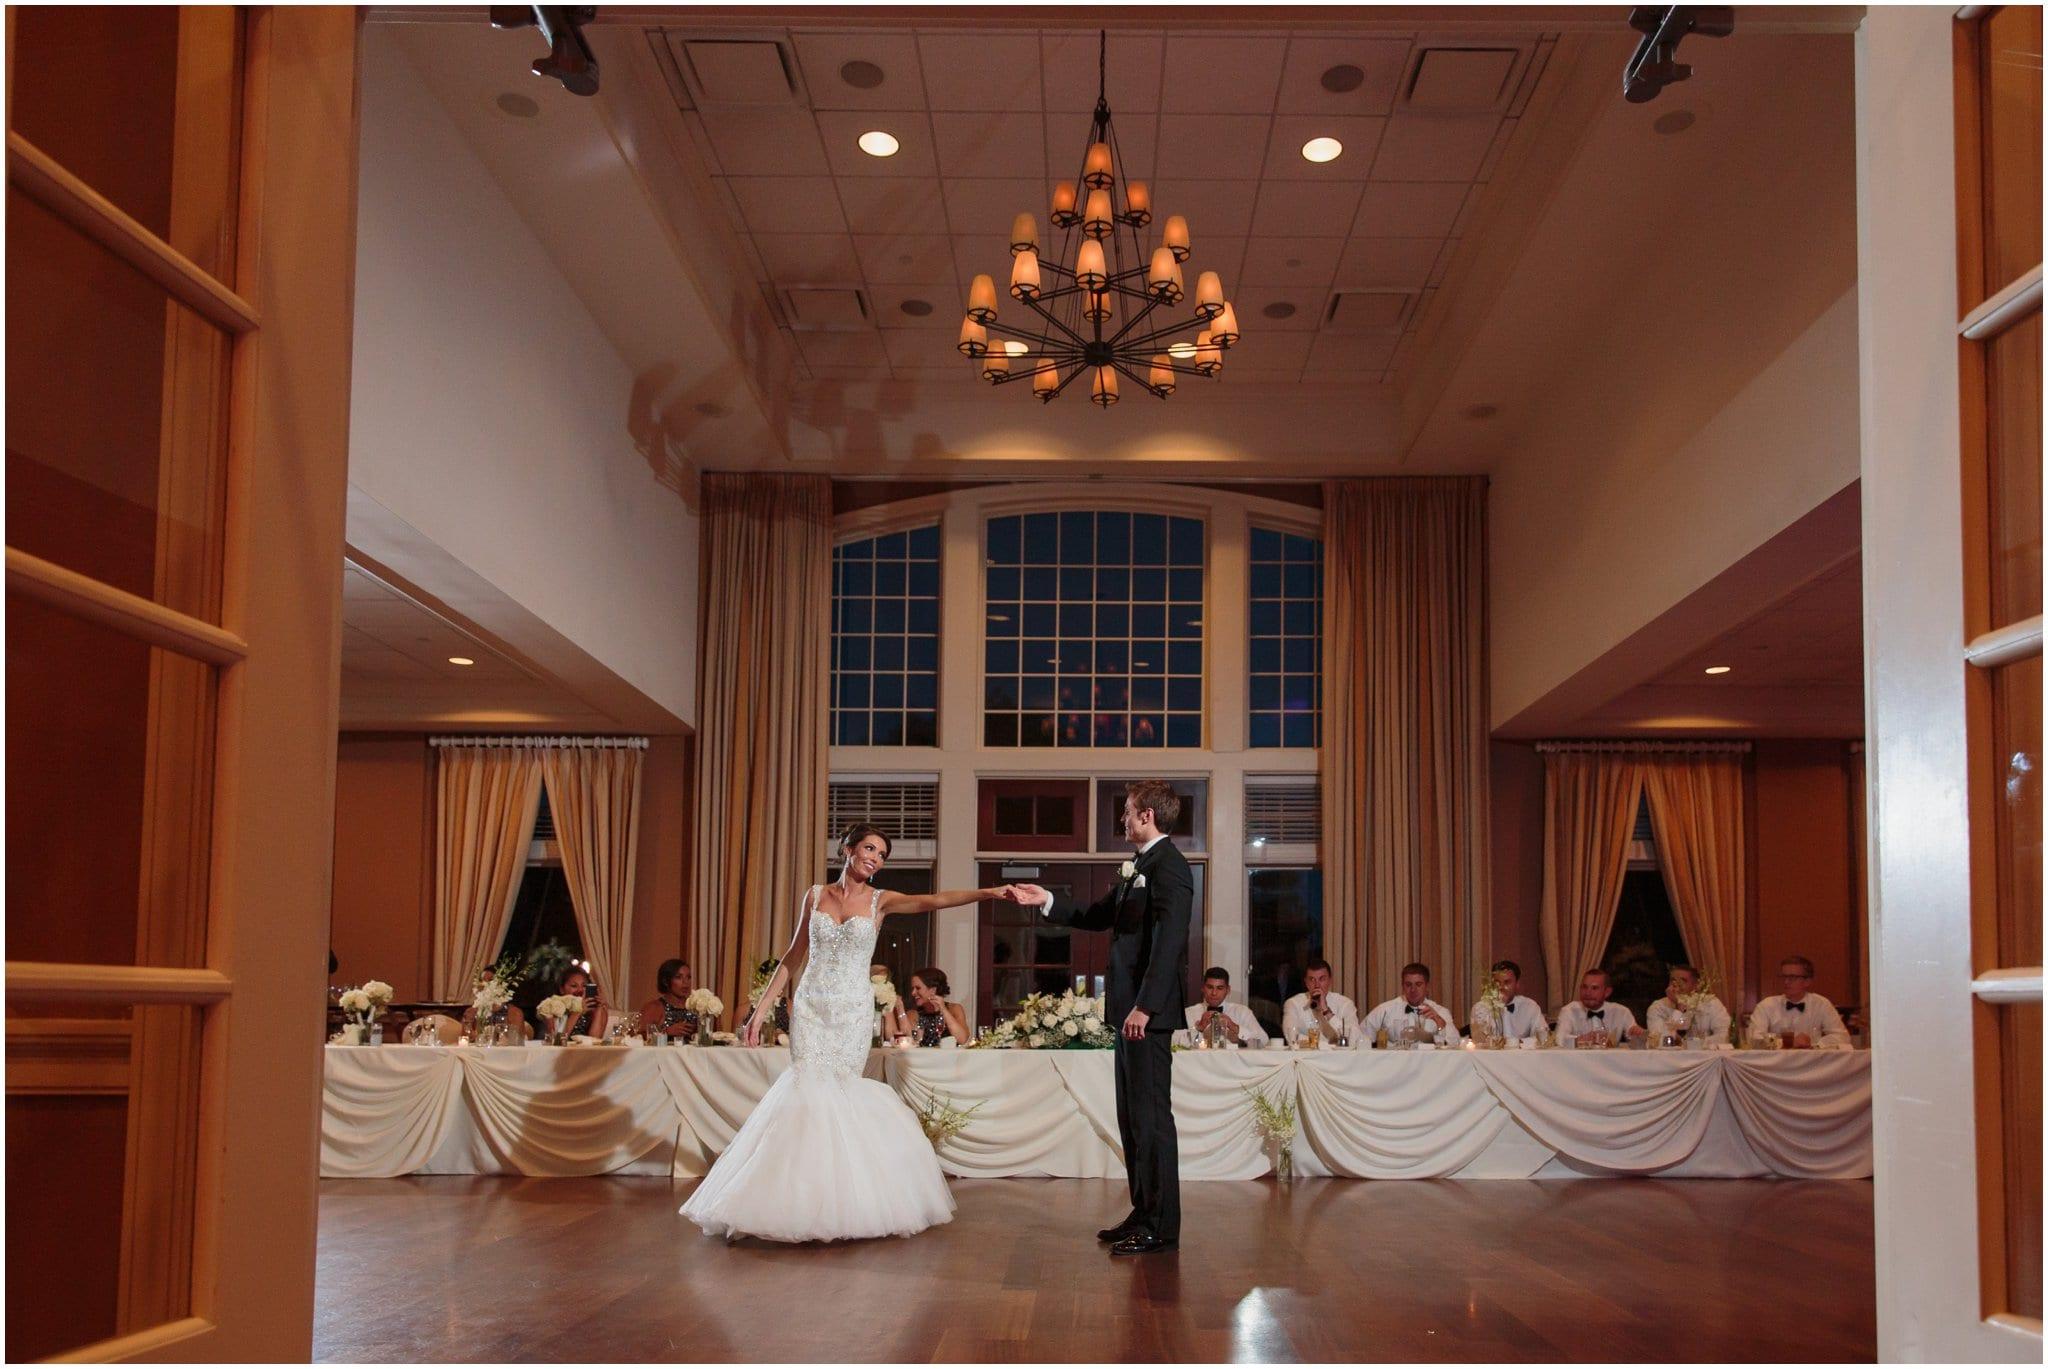 Arrowhead Wedding Photography - Wes Craft Photography